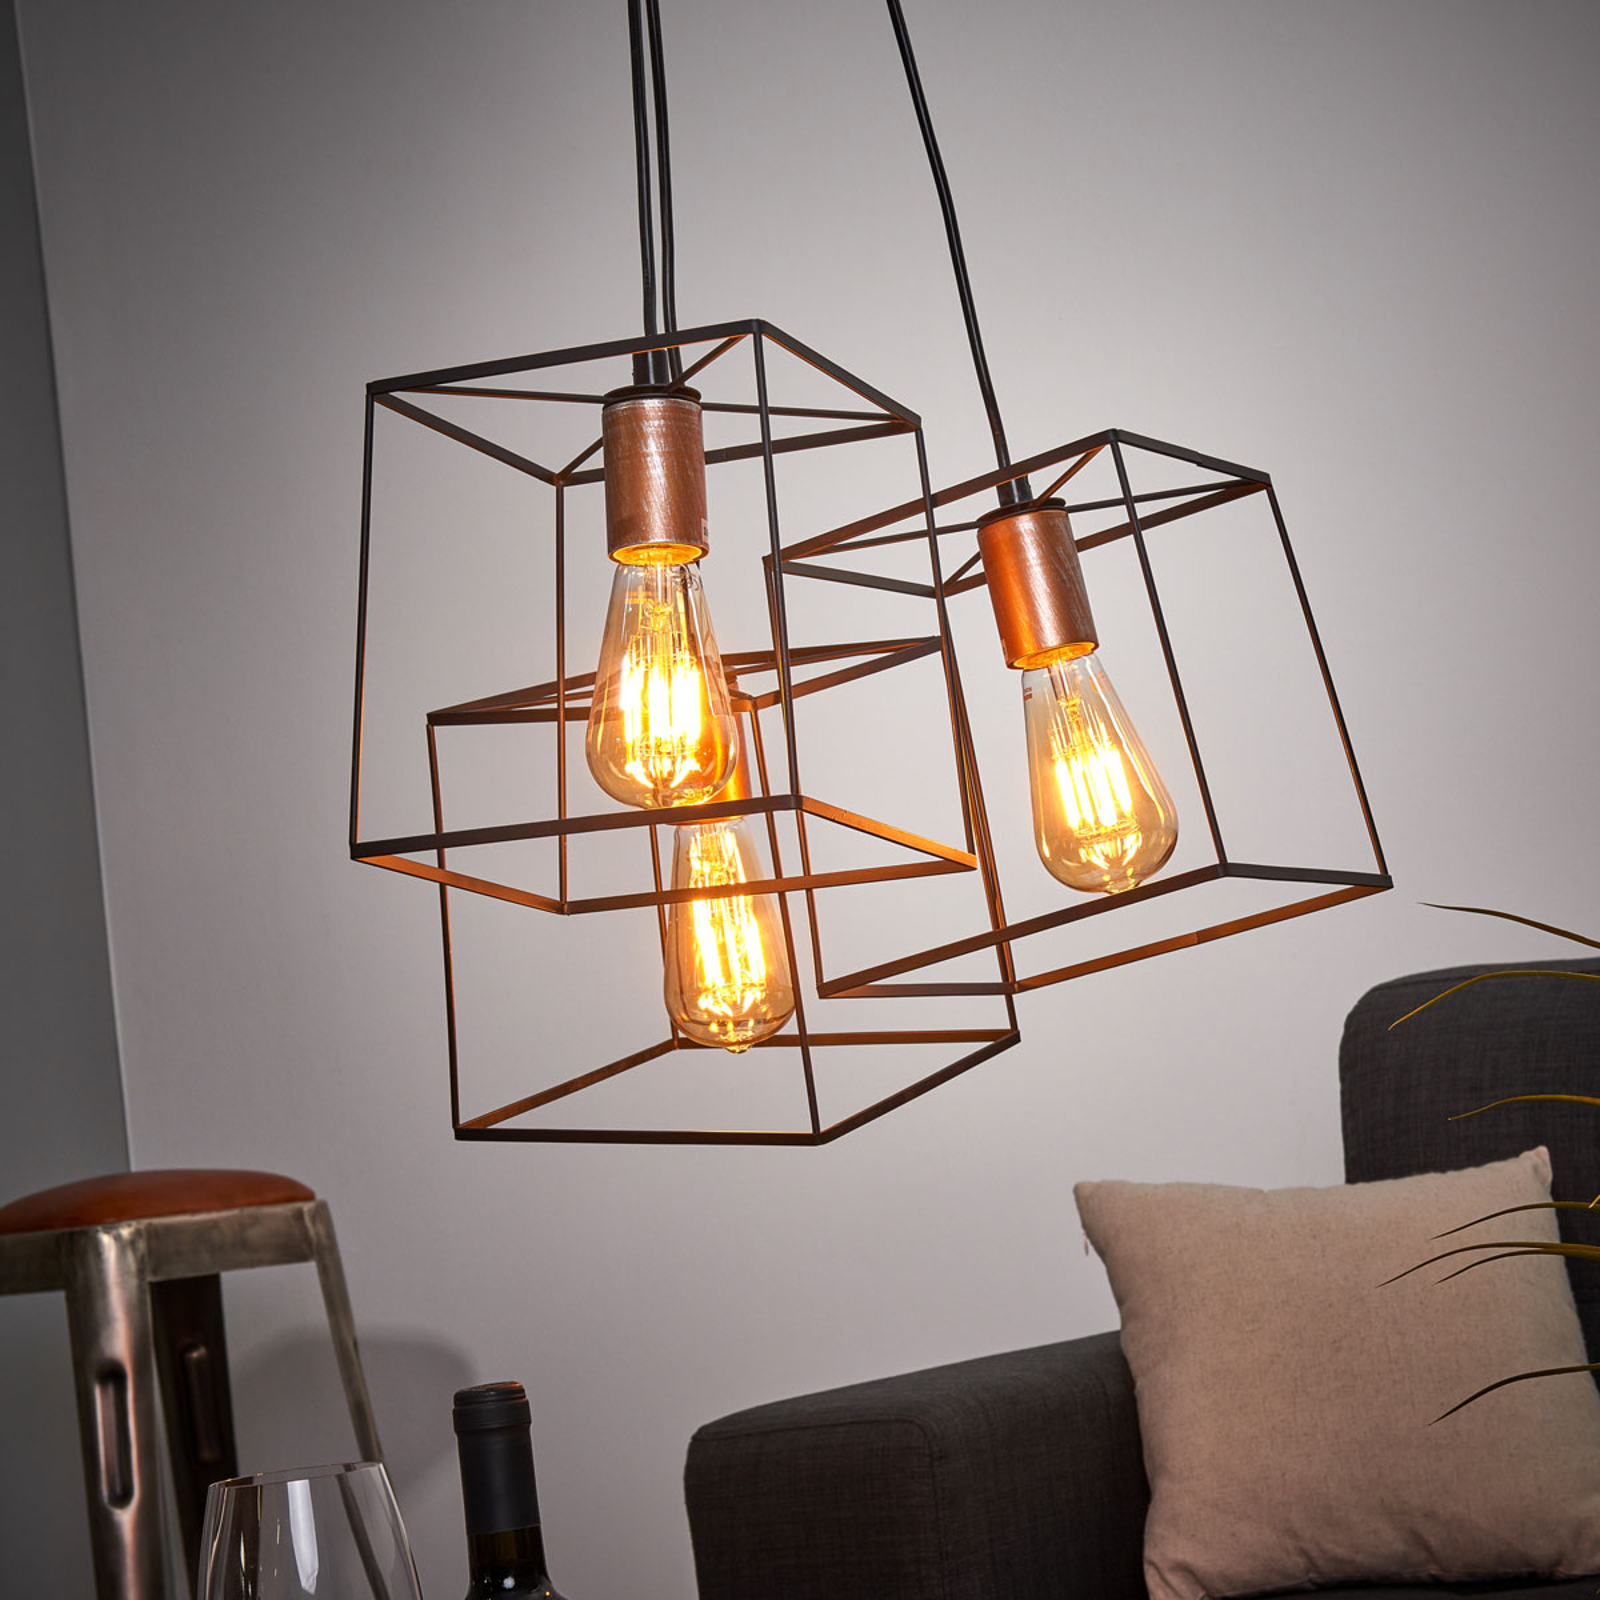 Lampa wisząca Agata w stylu Vintage